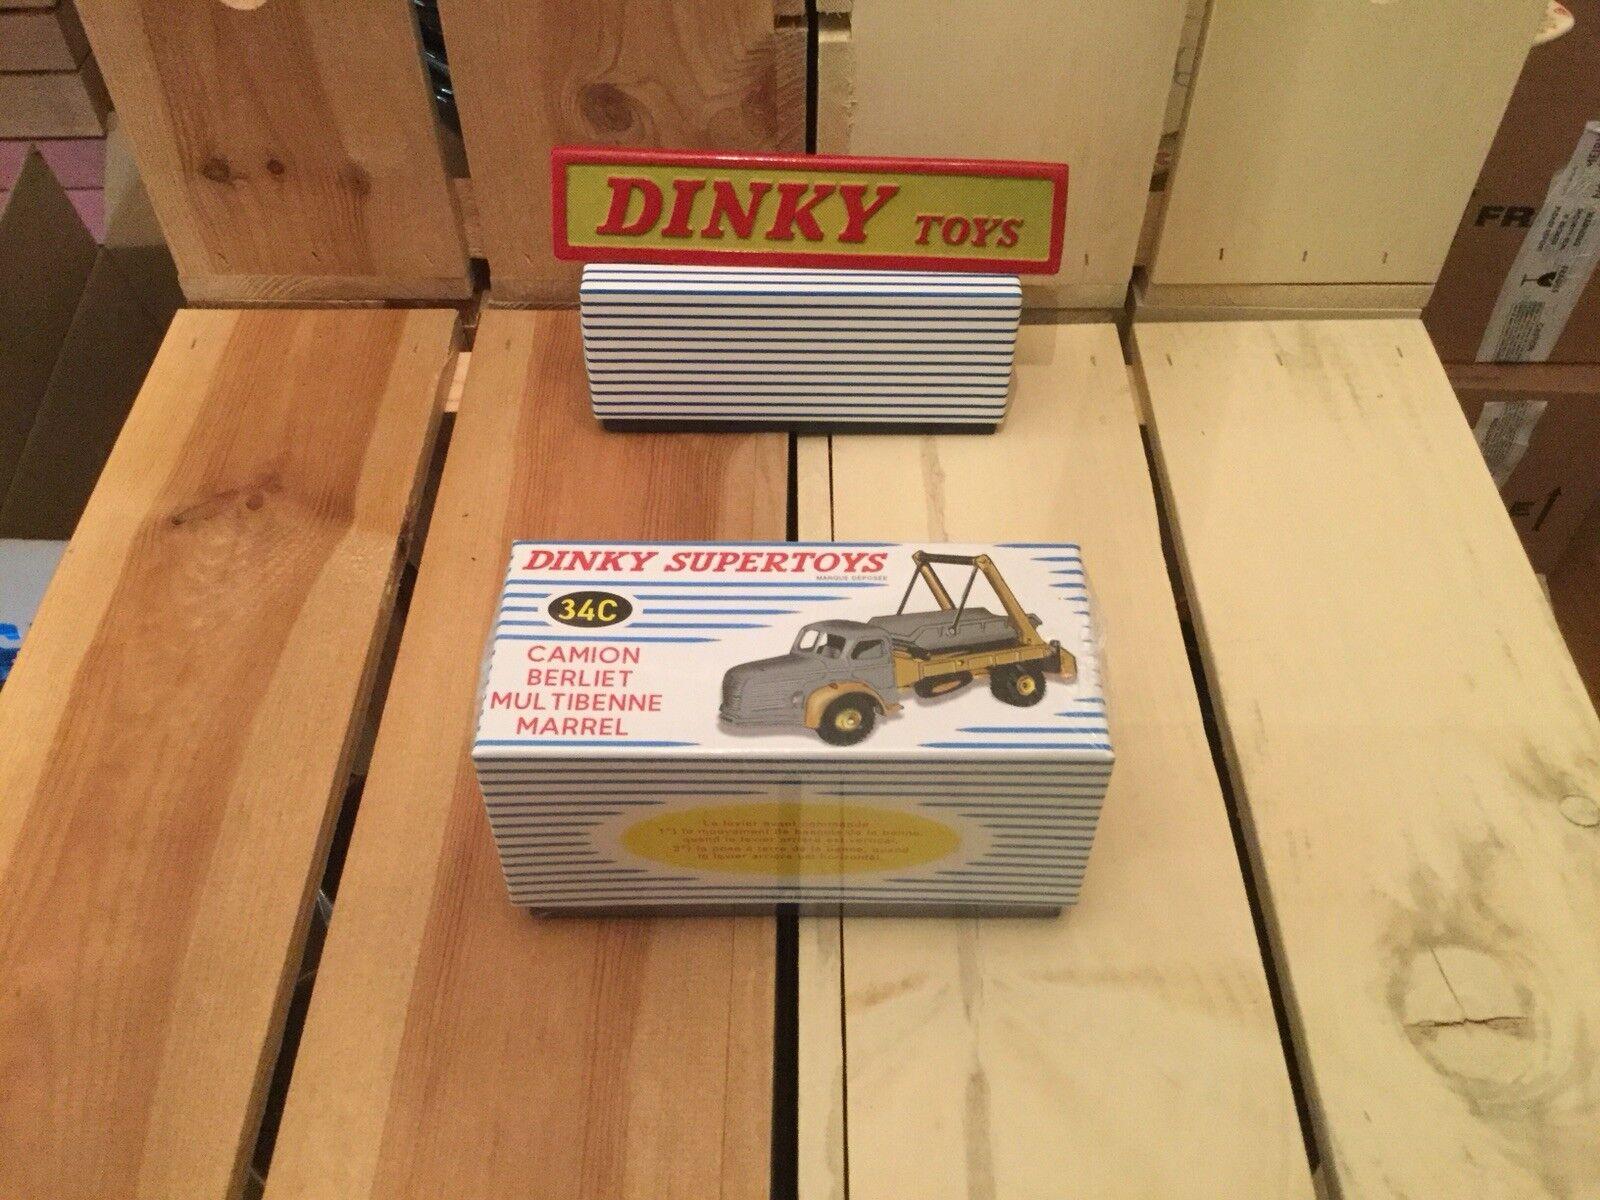 Atlas Dinky Toys Camion Berliet Multibenne Marrel 34C